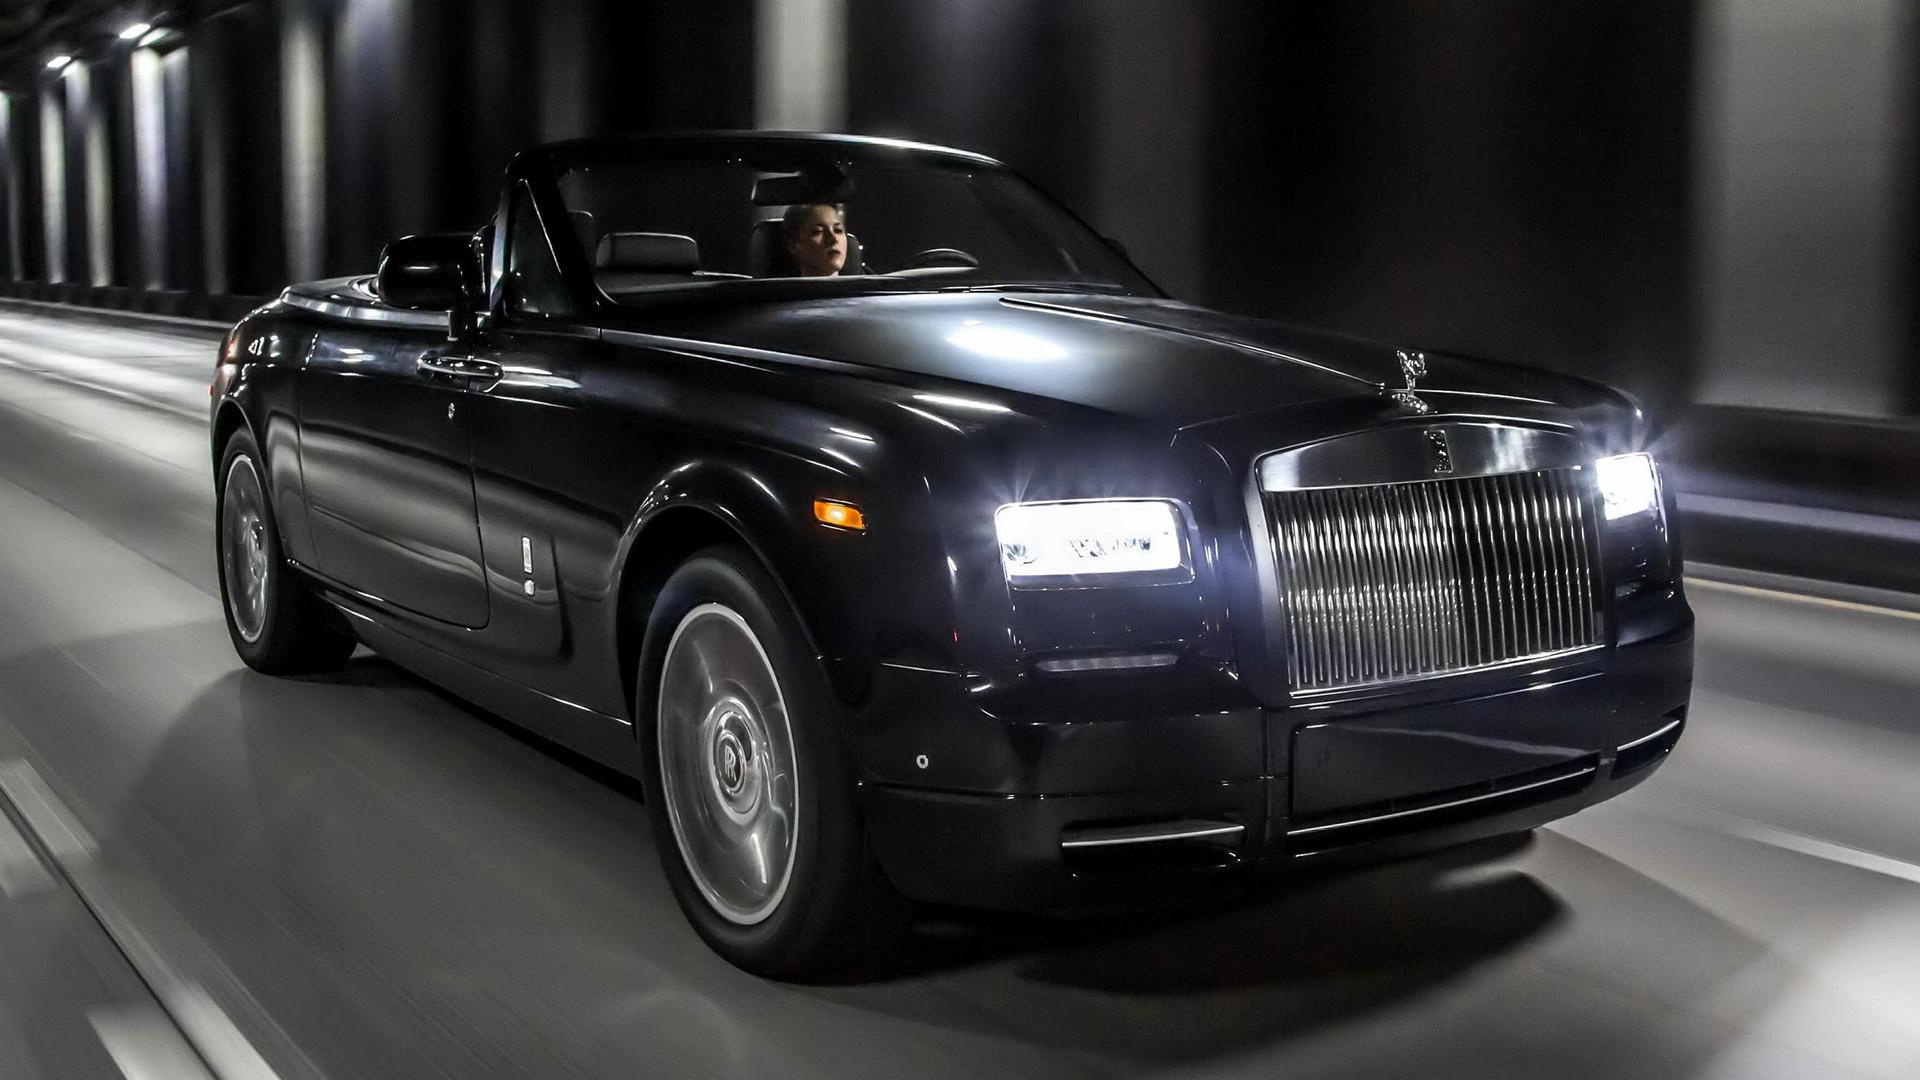 2015 Rolls Royce Phantom Limelight Wallpaper: Rolls-Royce Phantom Drophead Coupe Nighthawk (2015